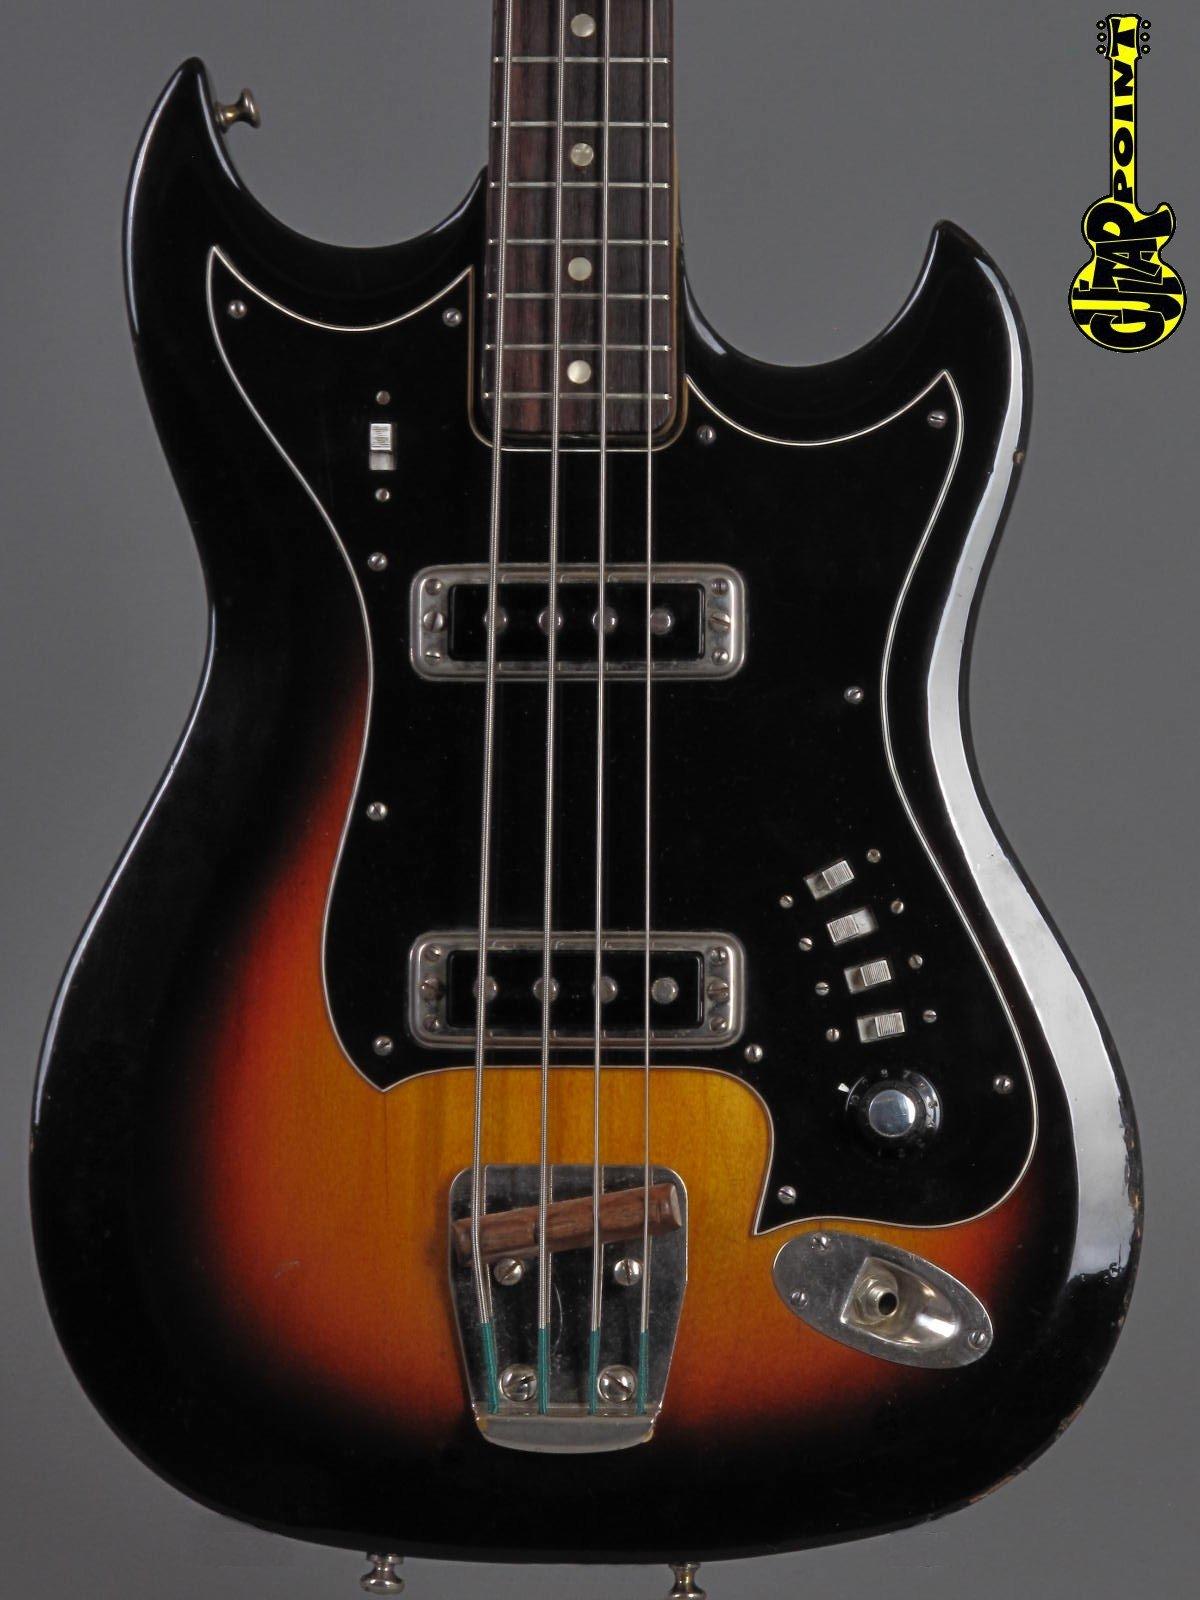 1967 Hagstrom H2B - 4-String Bass - Sunburst